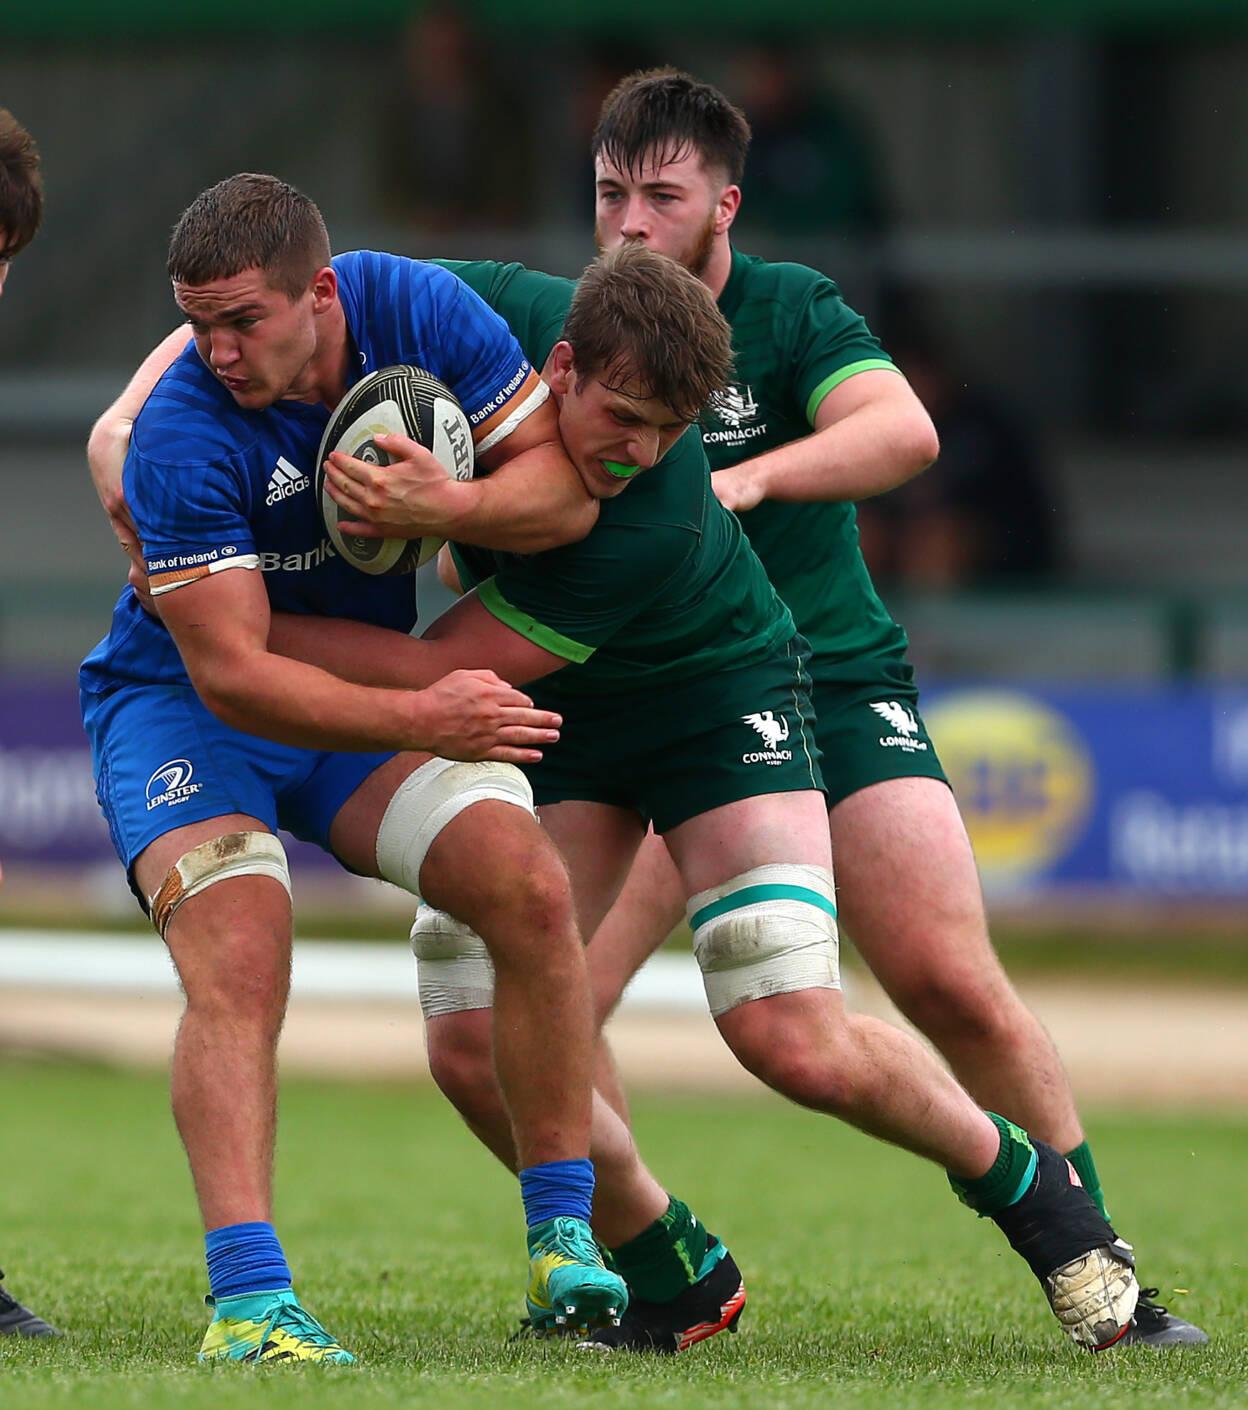 Leinster Bring In Kearney, Deegan And Penny For Edinburgh Clash